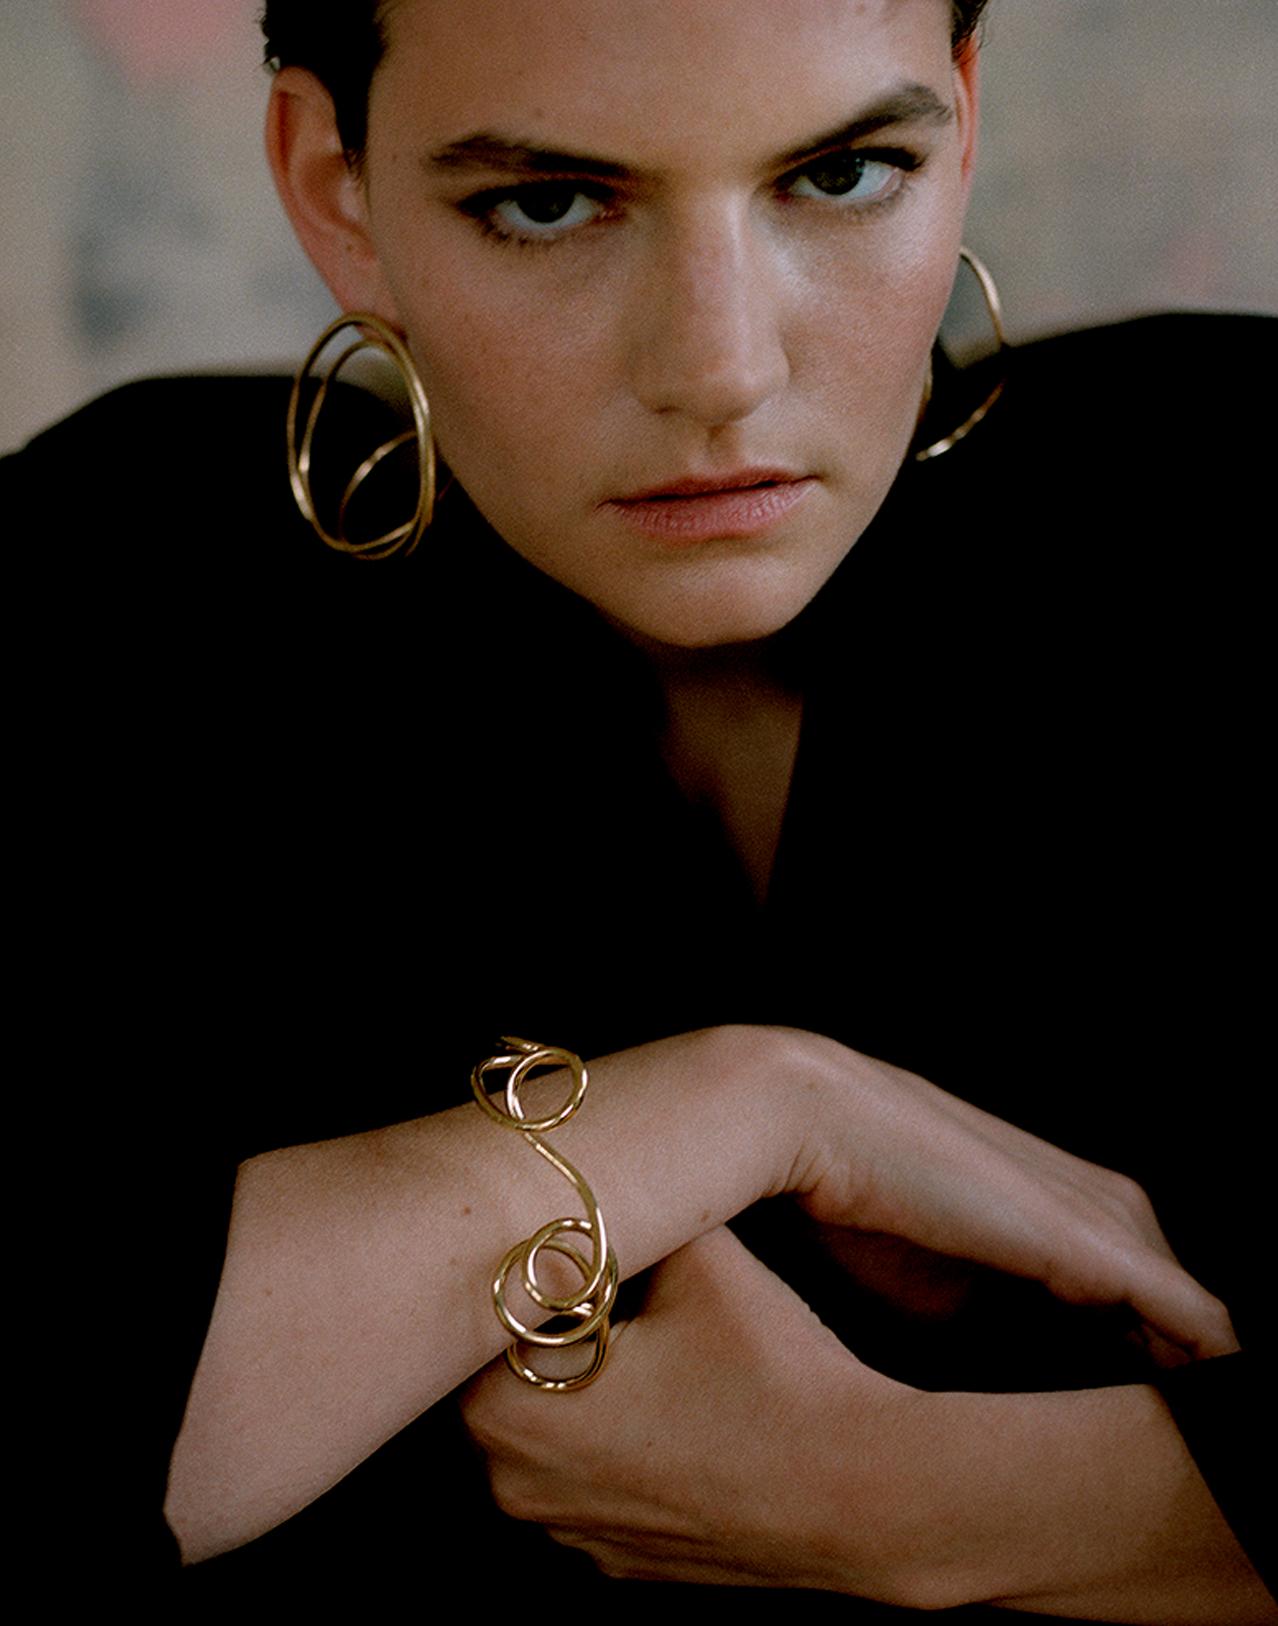 Completedworks-jewellery-S1004-An-Element-of-Suspense-Bracelets-1-11.jpg